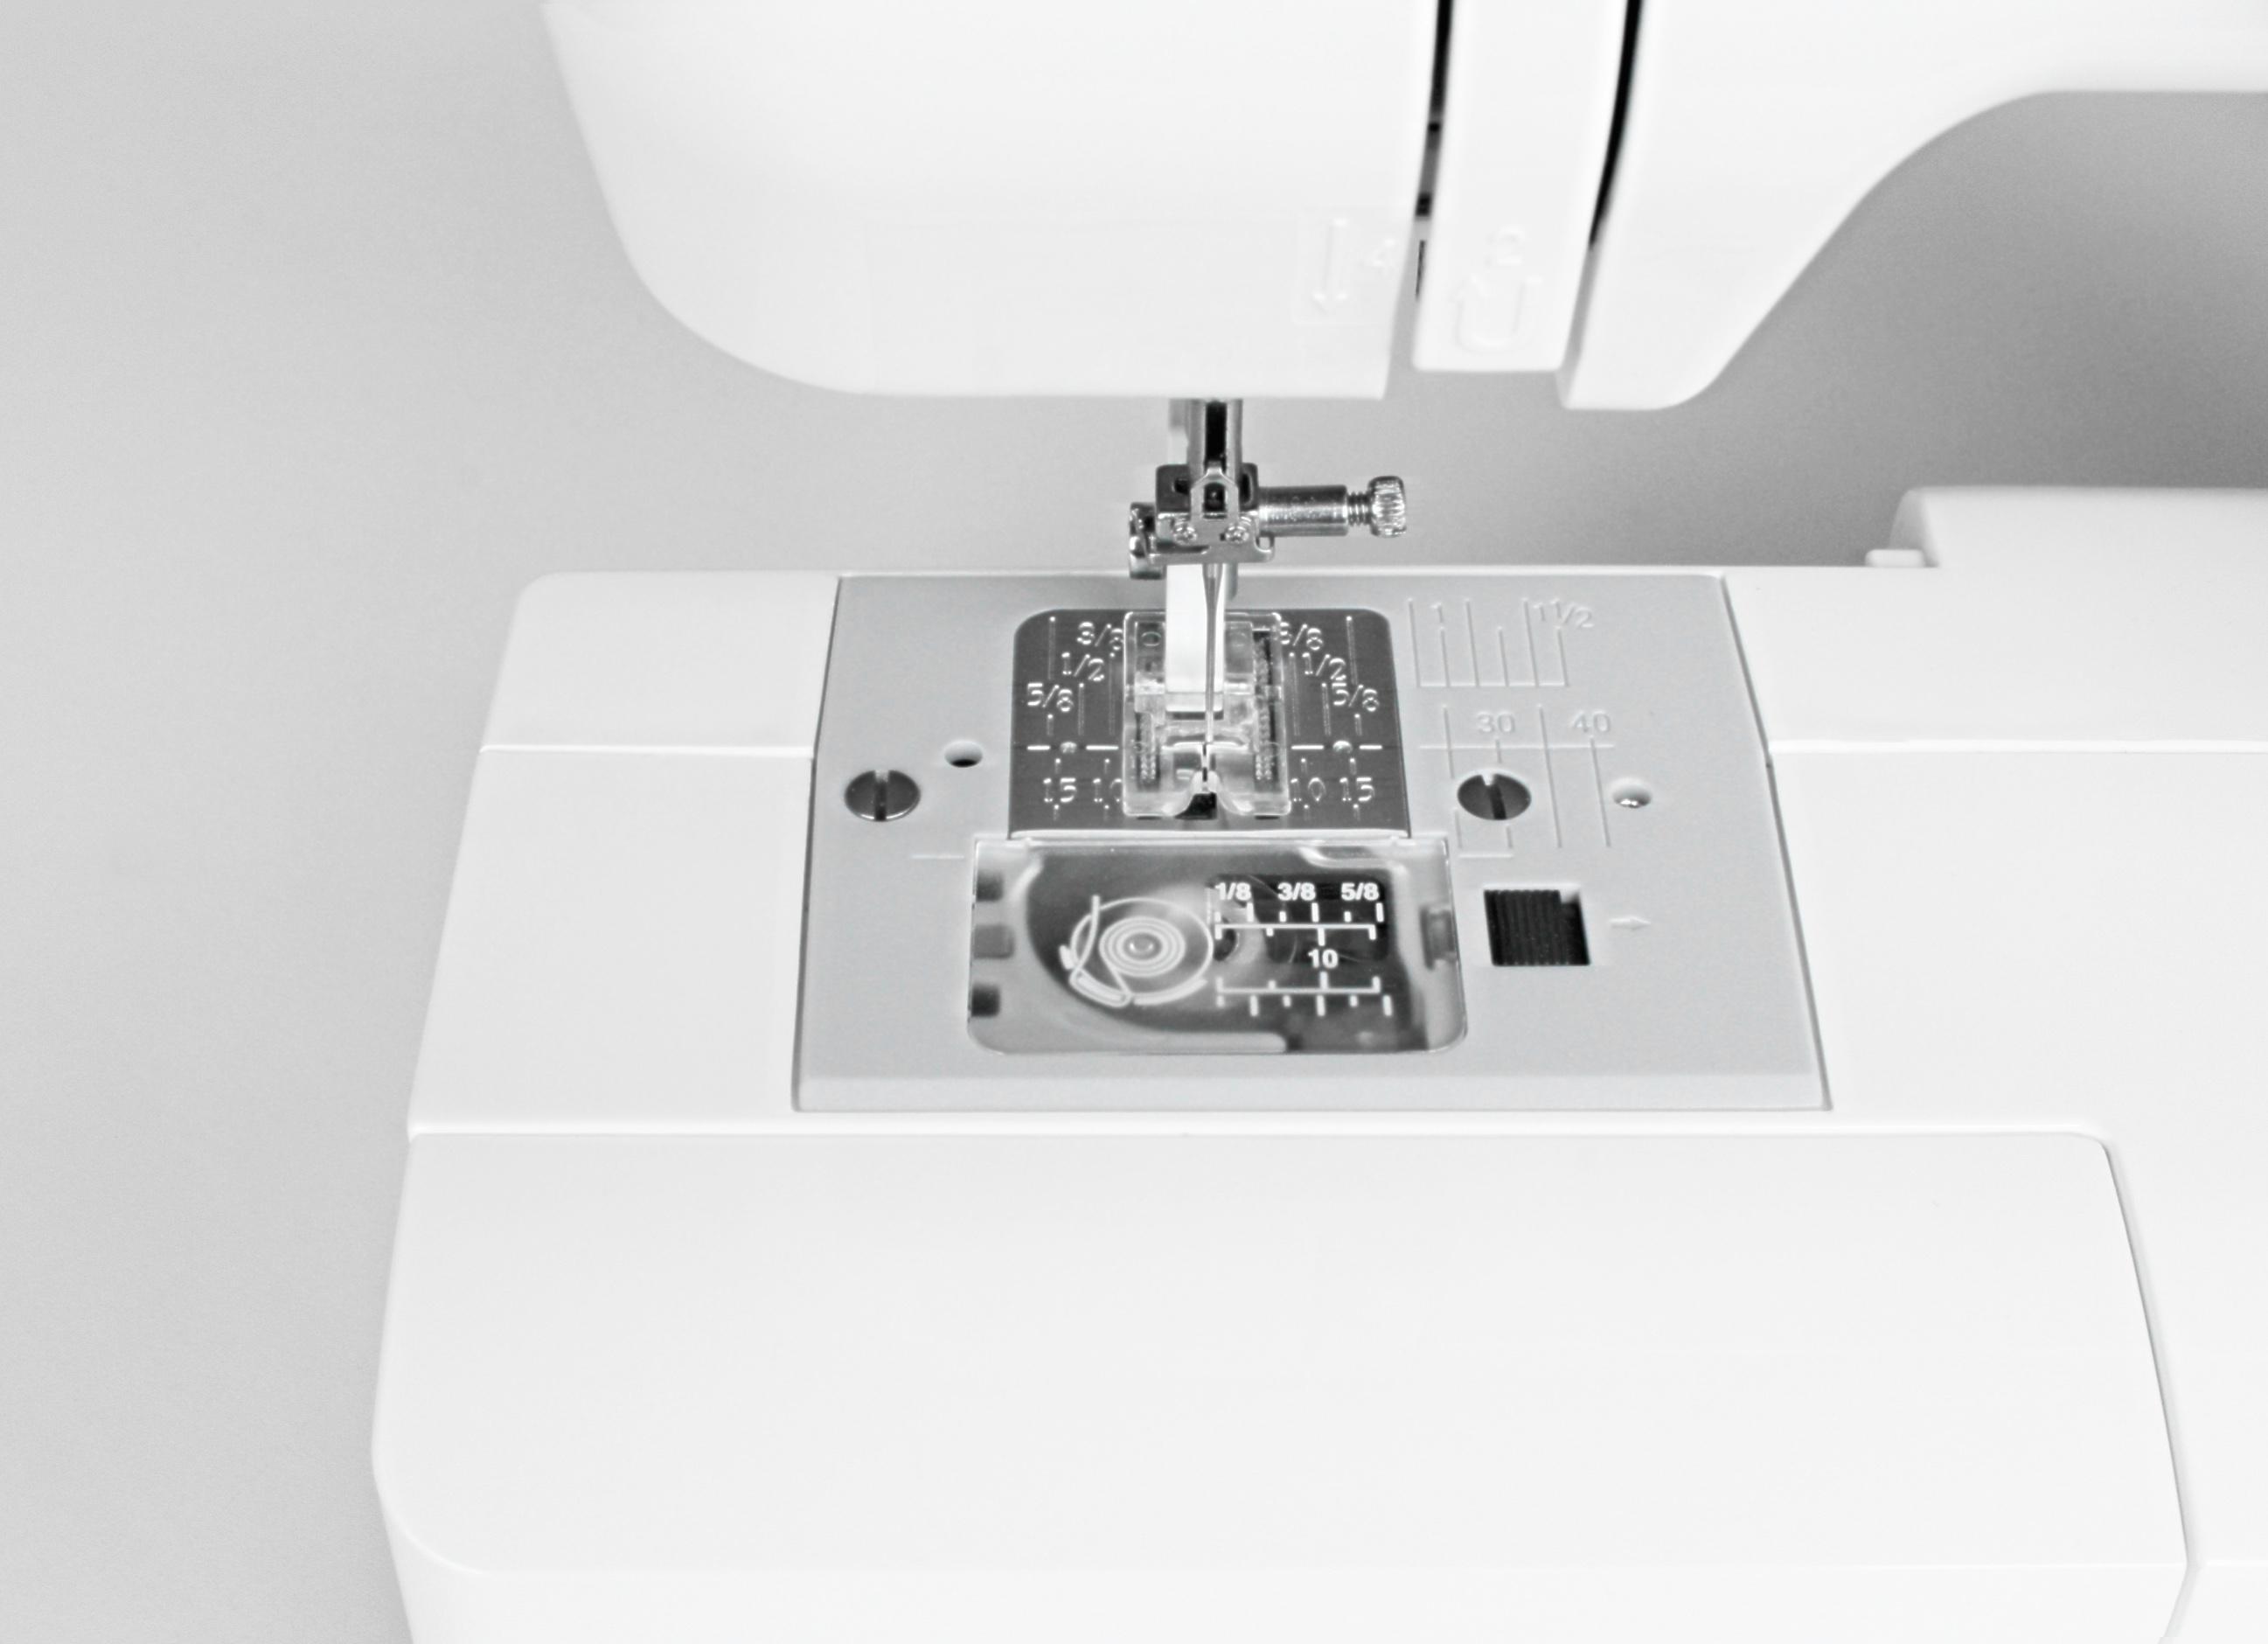 šicí stroj Elna eXplore 150-2